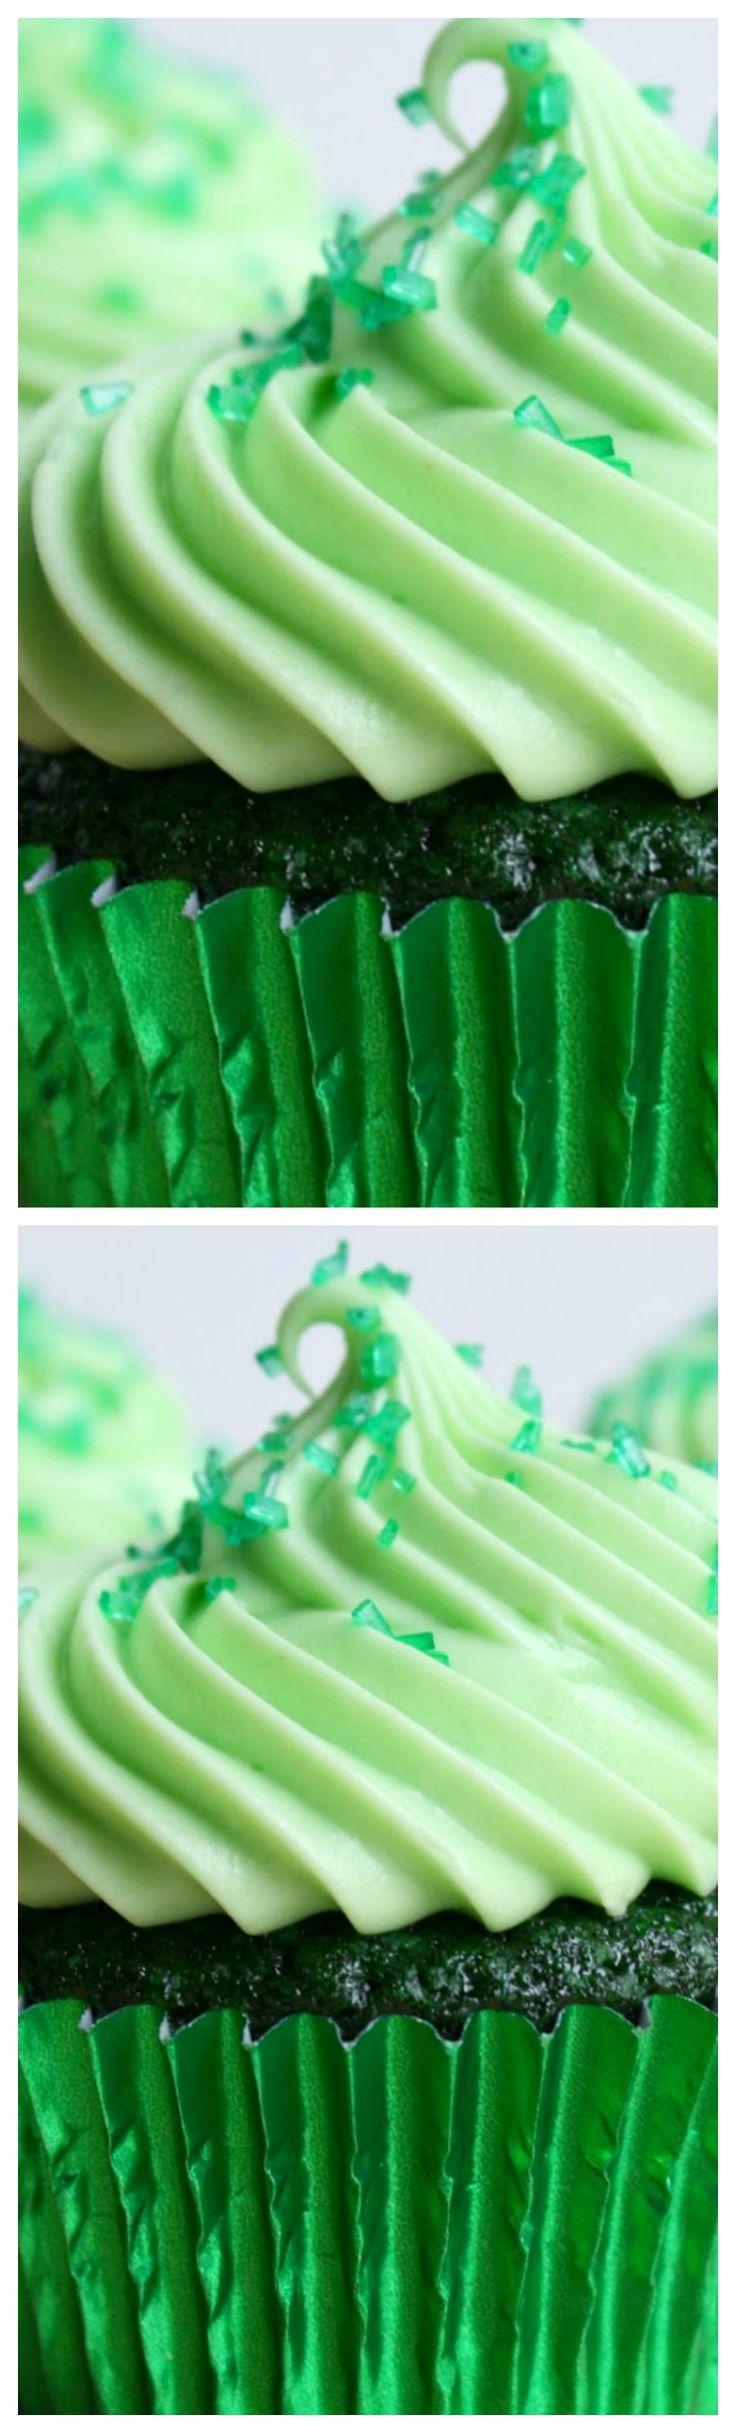 Green Velvet Cupcakes ~ Moist and fluffy green velvet cupcakes with cream cheese frosting.